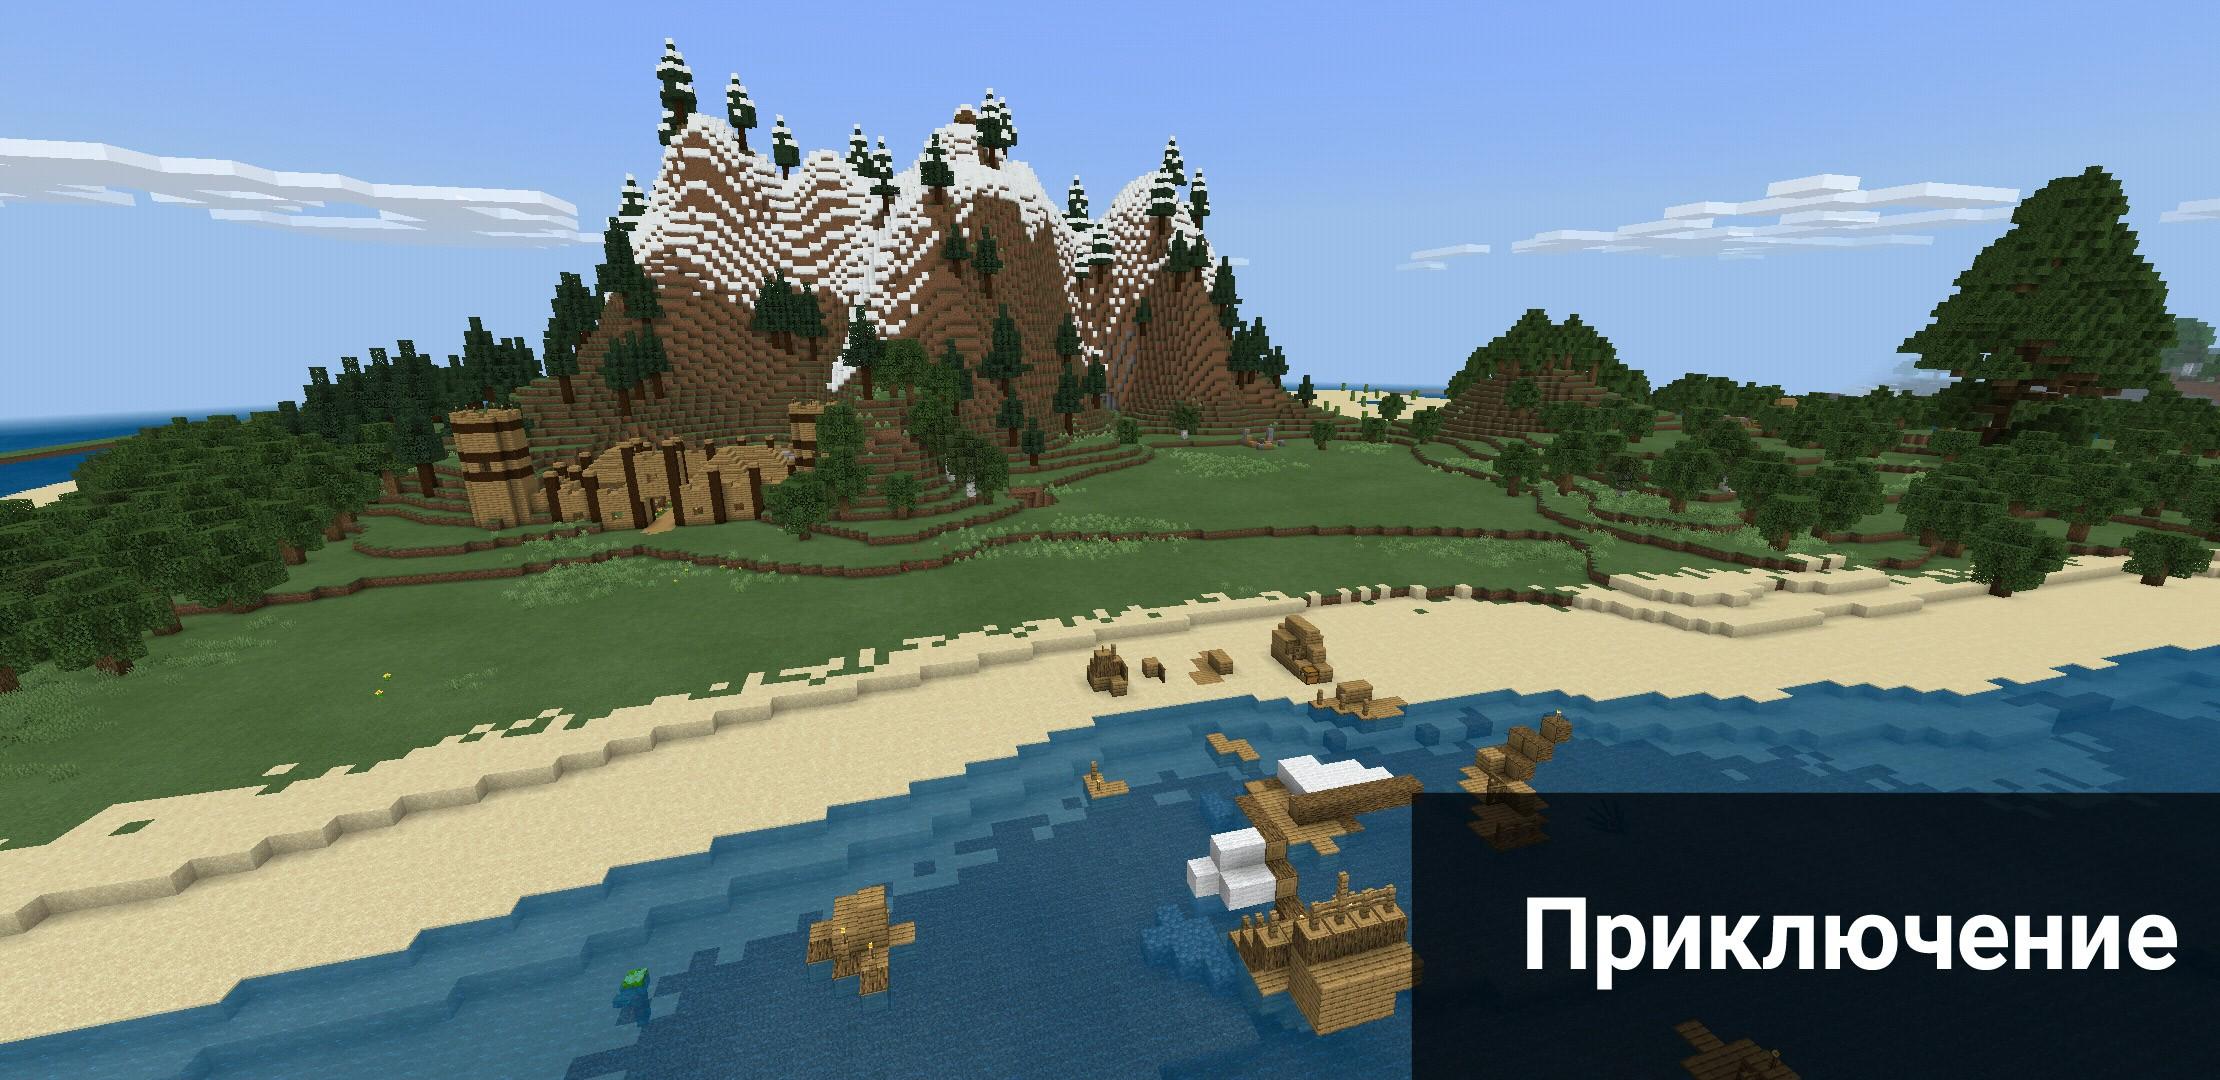 Карта на остров приключений для Майнкрафт ПЕ